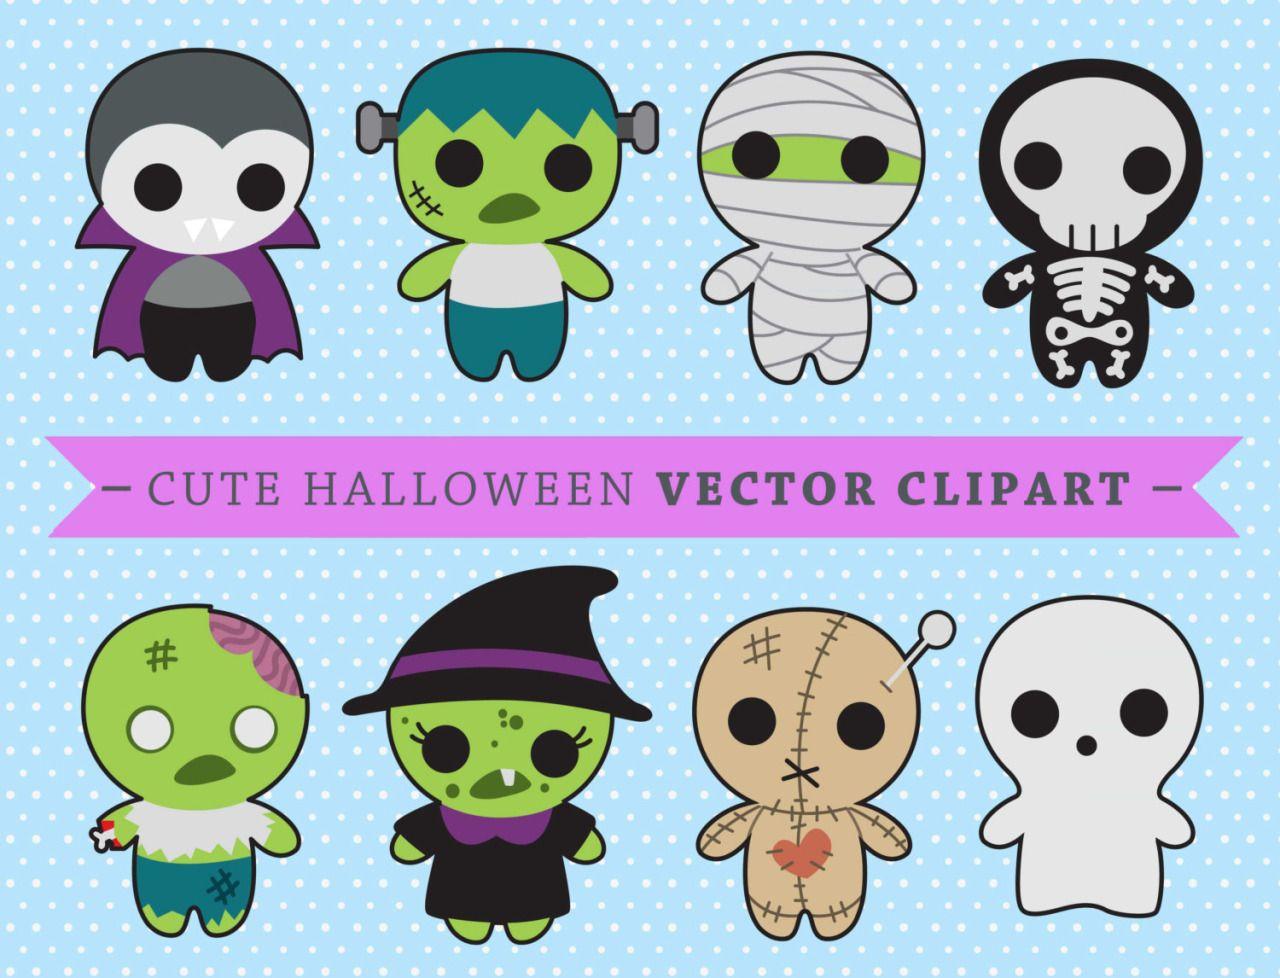 premium vector clipart kawaii spooky halloween halloween monsters clipart high quality vectors instant download kawaii clipart [ 1280 x 978 Pixel ]